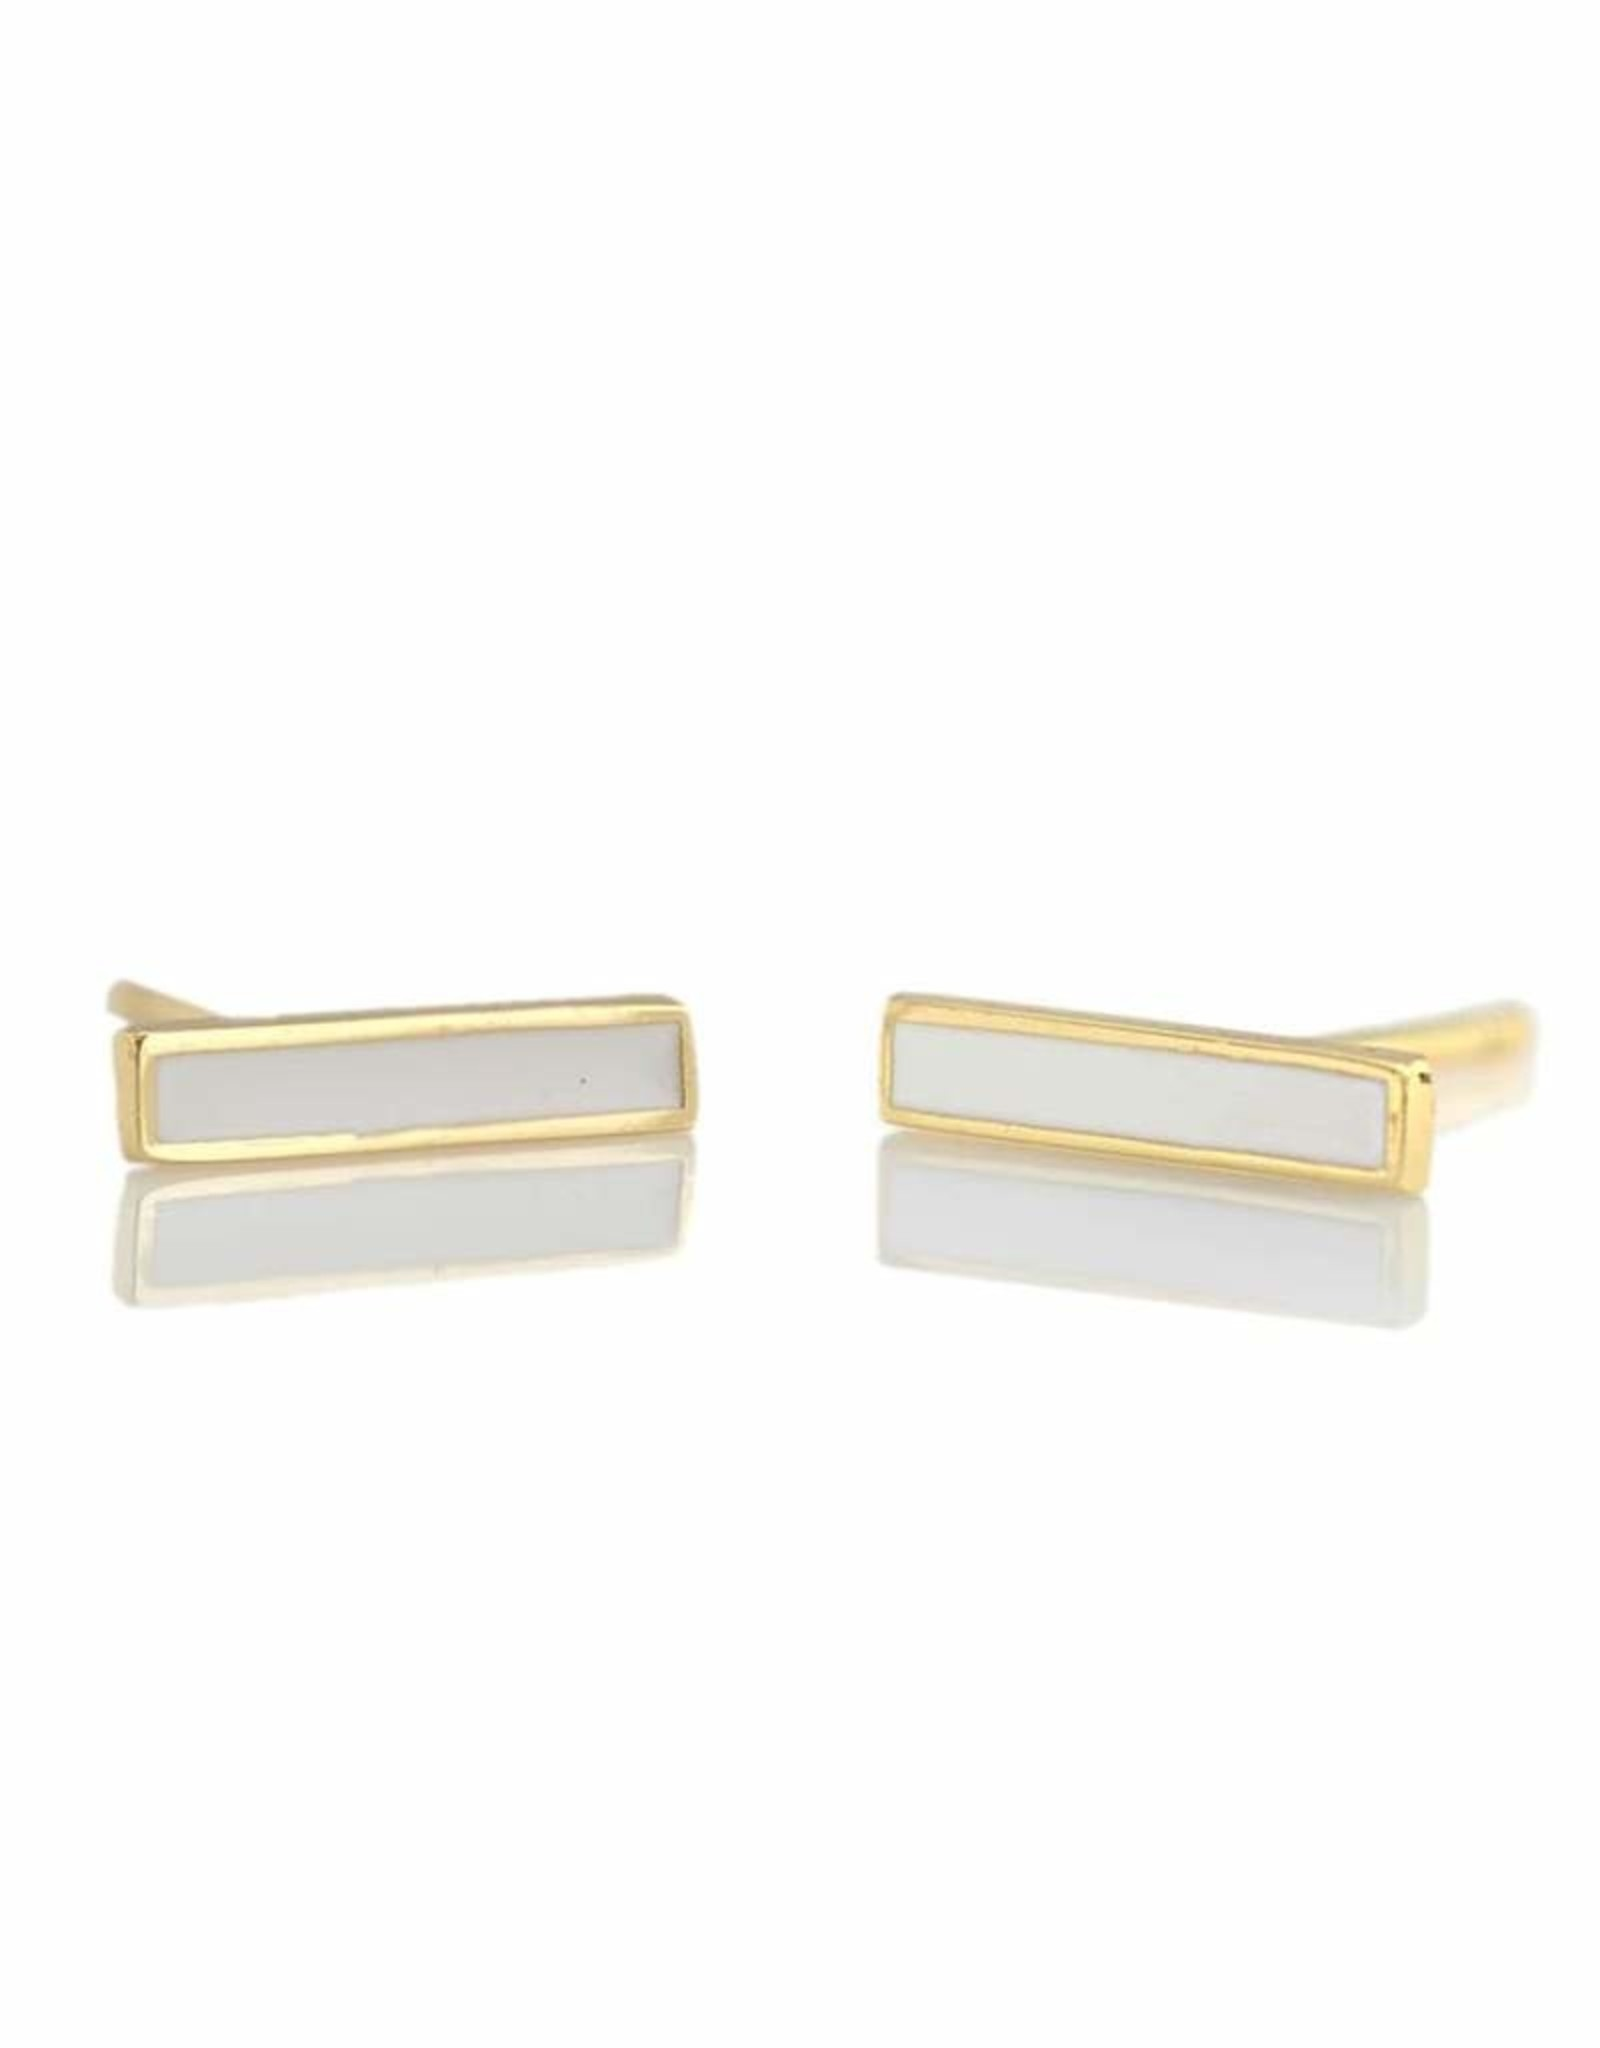 Kris Nations Bar Enamel Earrings